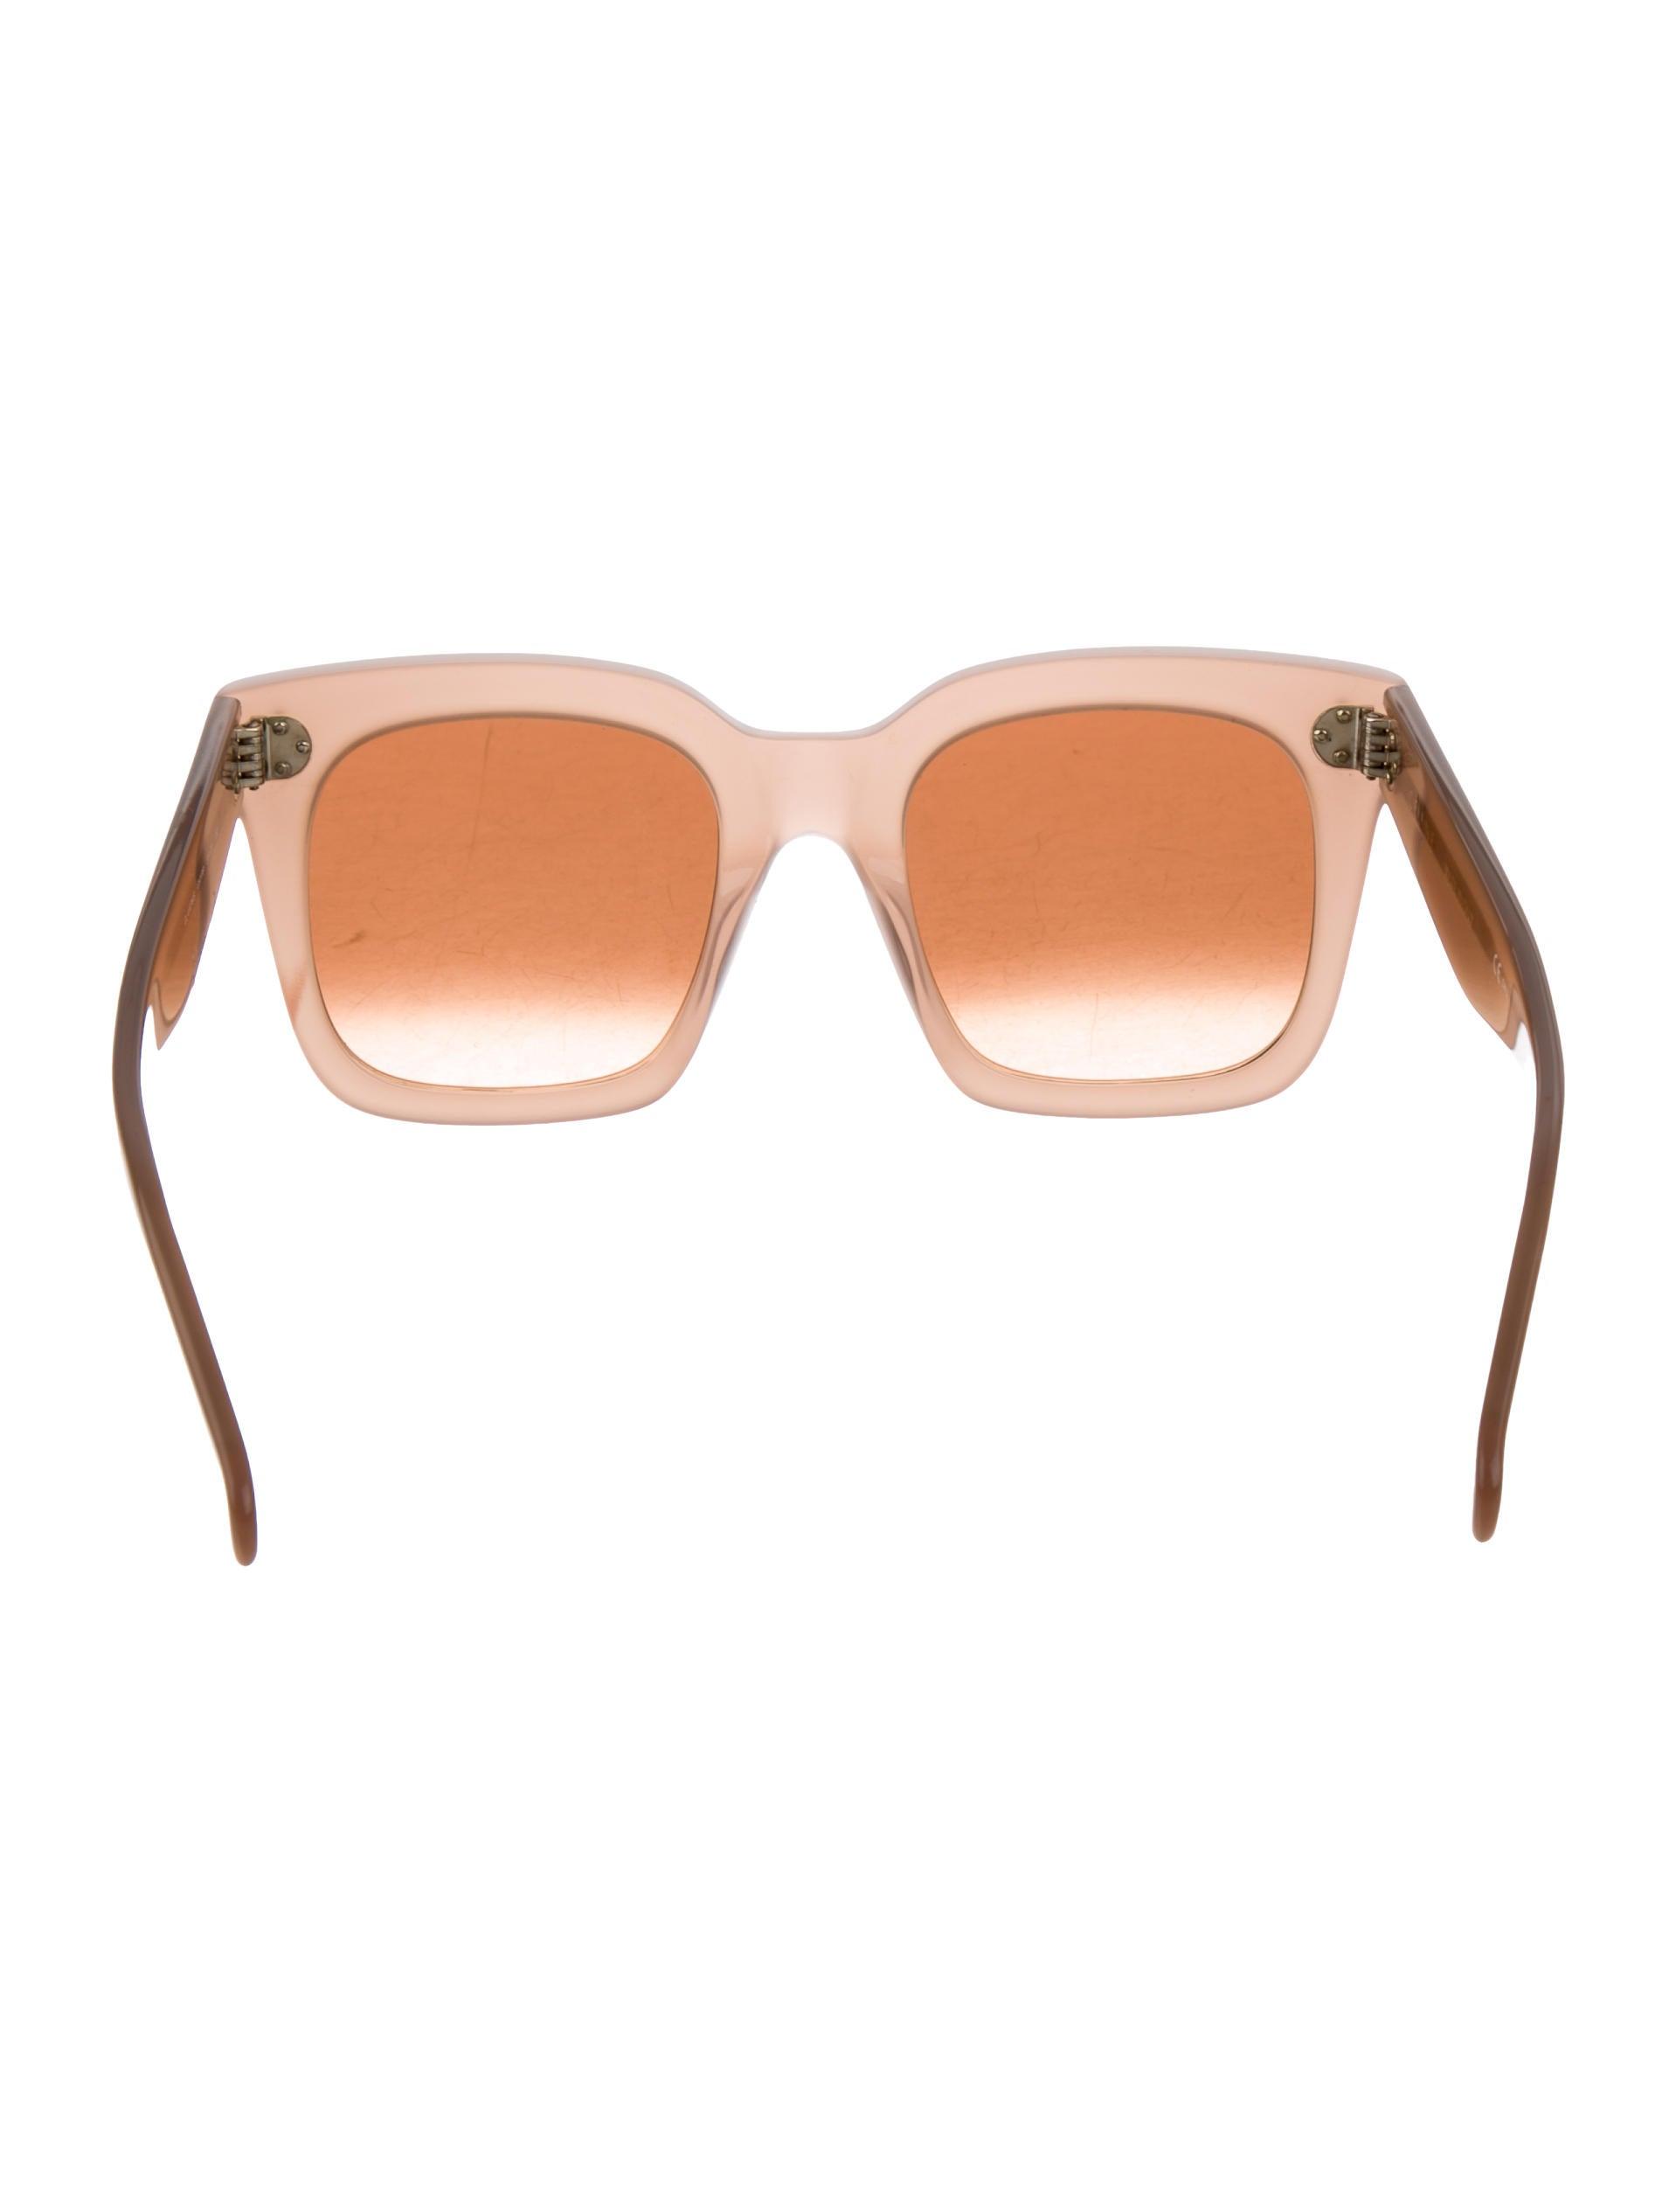 0b090fff0fe Celine Sunglasses Tilda Ebay